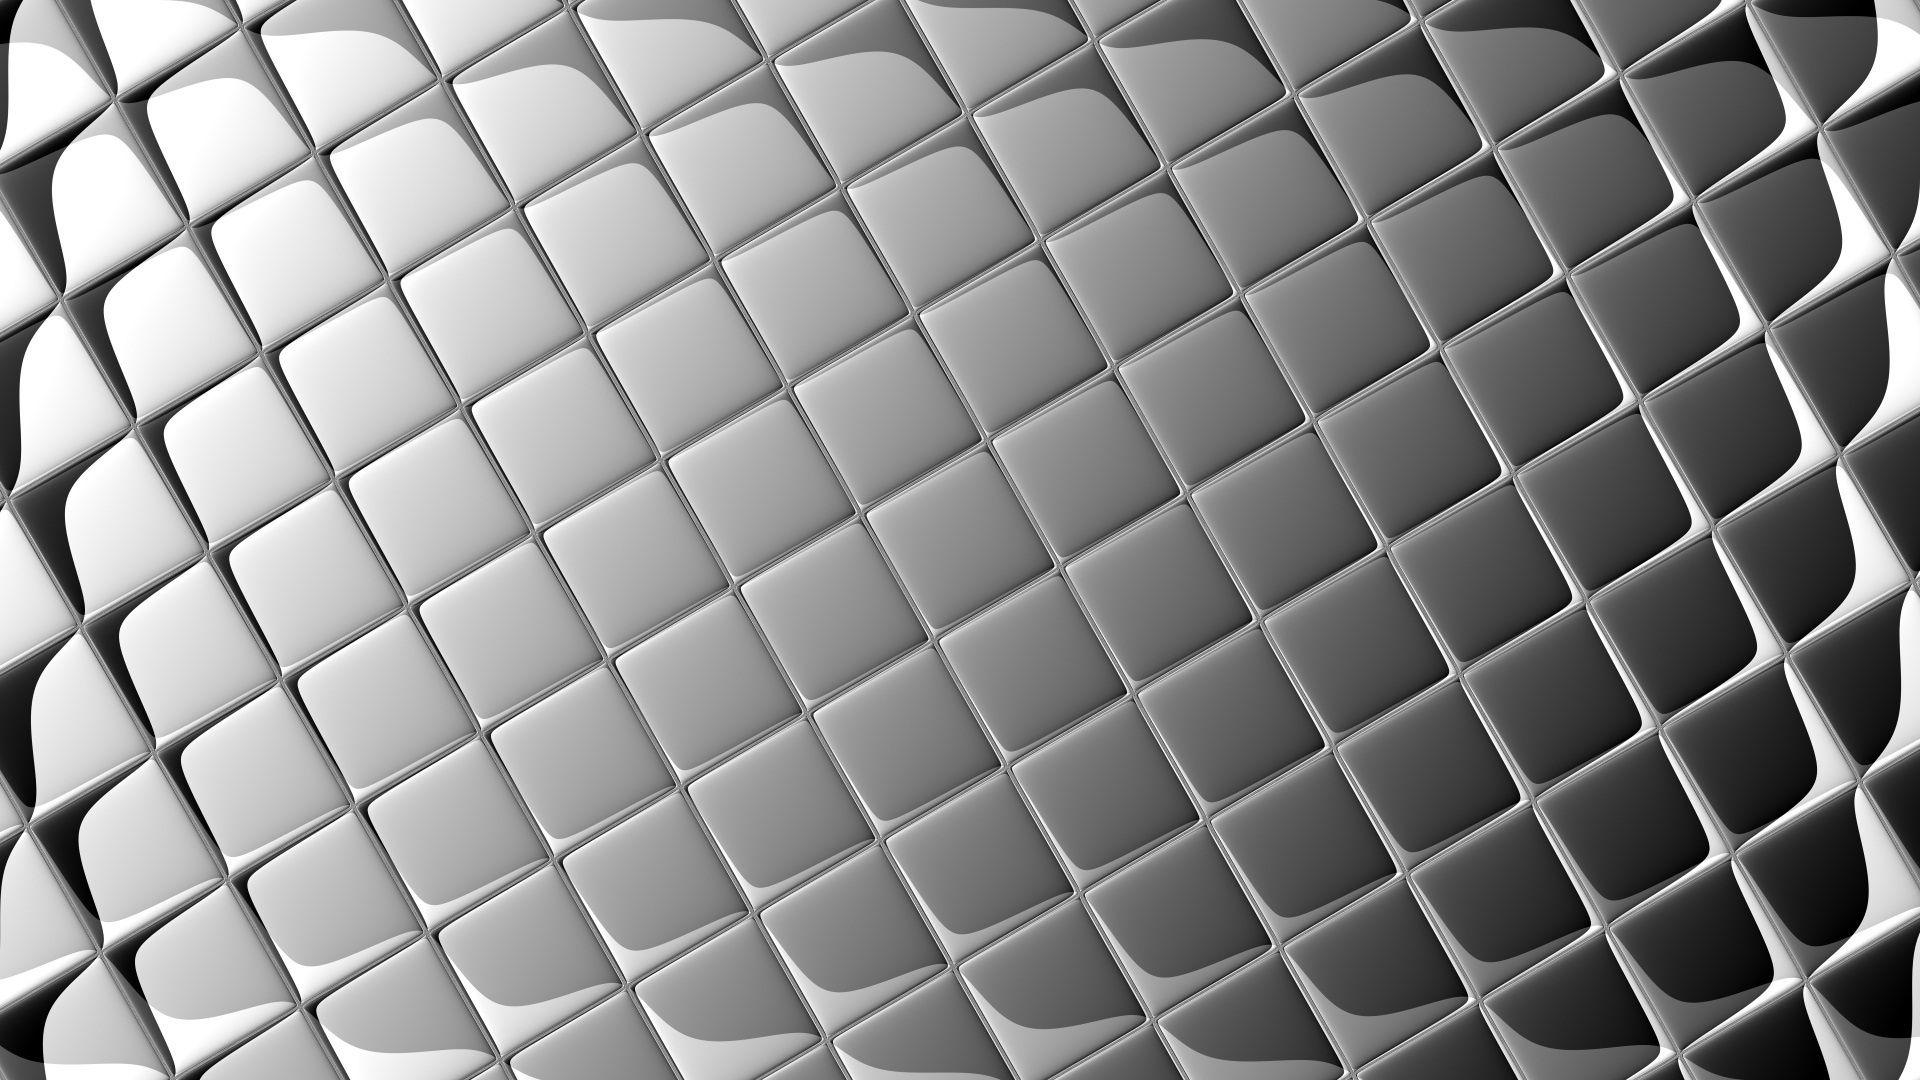 12 Fantastic HD Glossy Wallpapers - HDWallSource.com